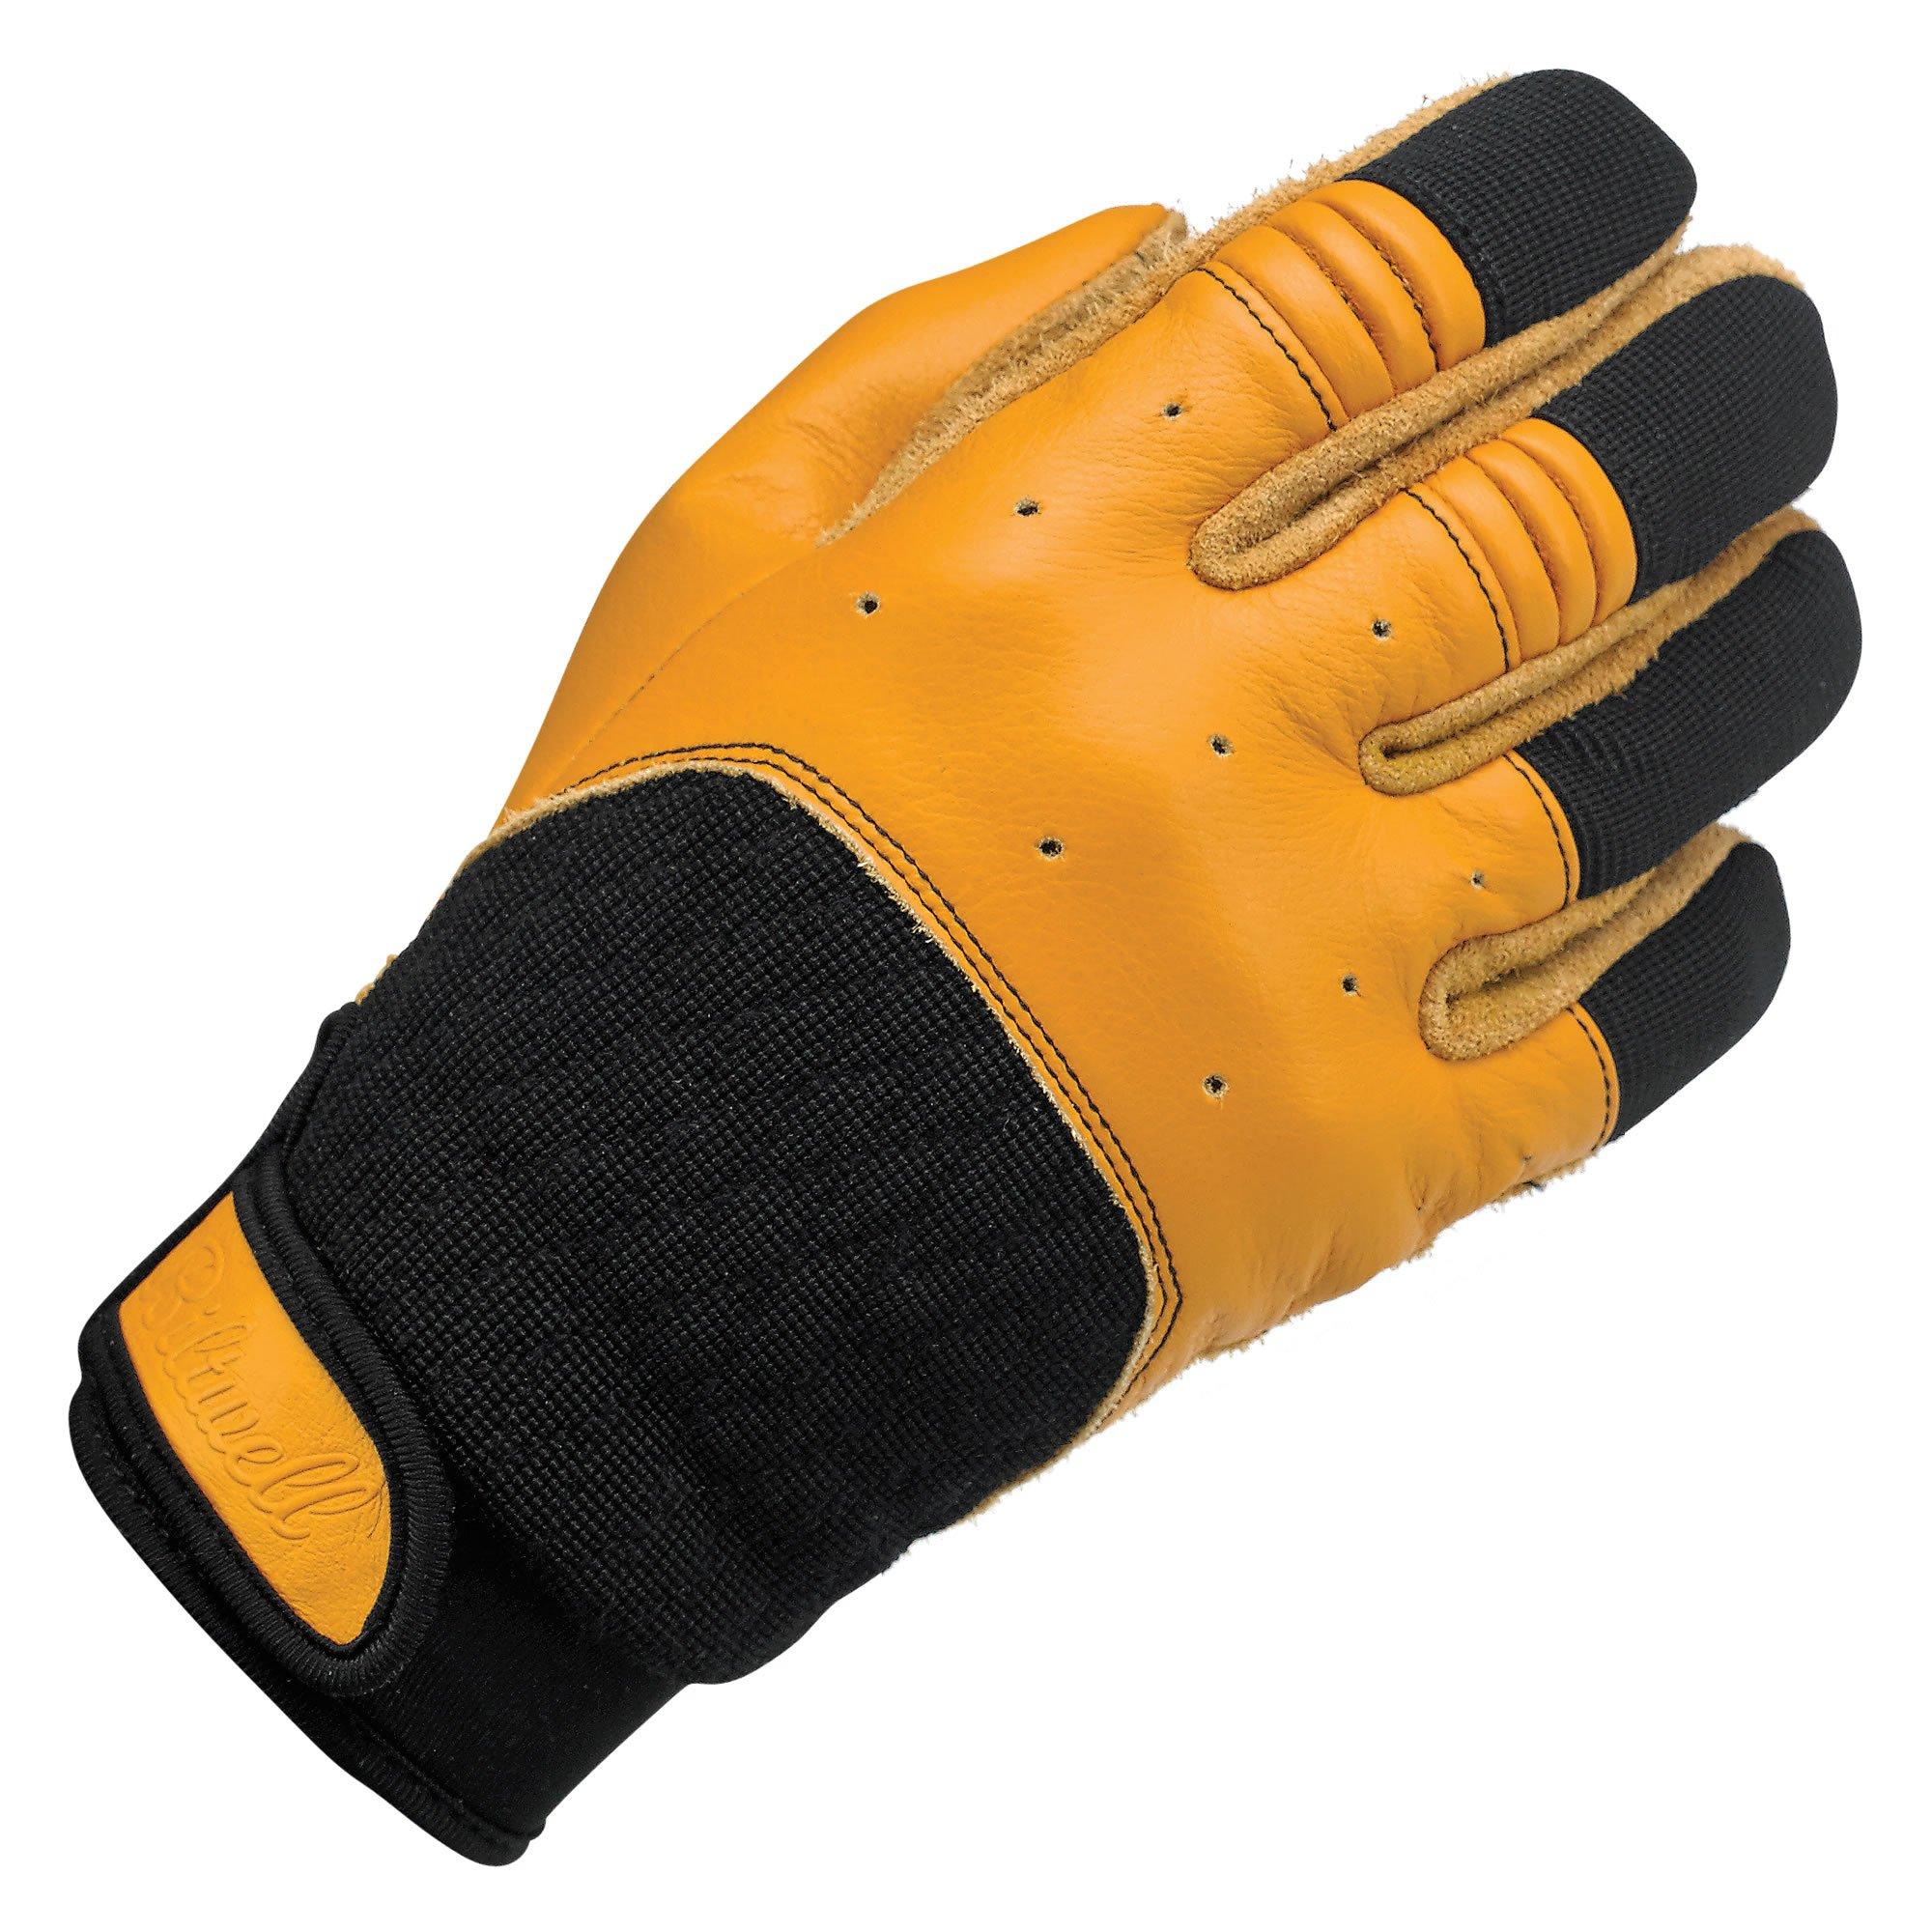 Biltwell Bantam Gloves (Tan/Black, Large)